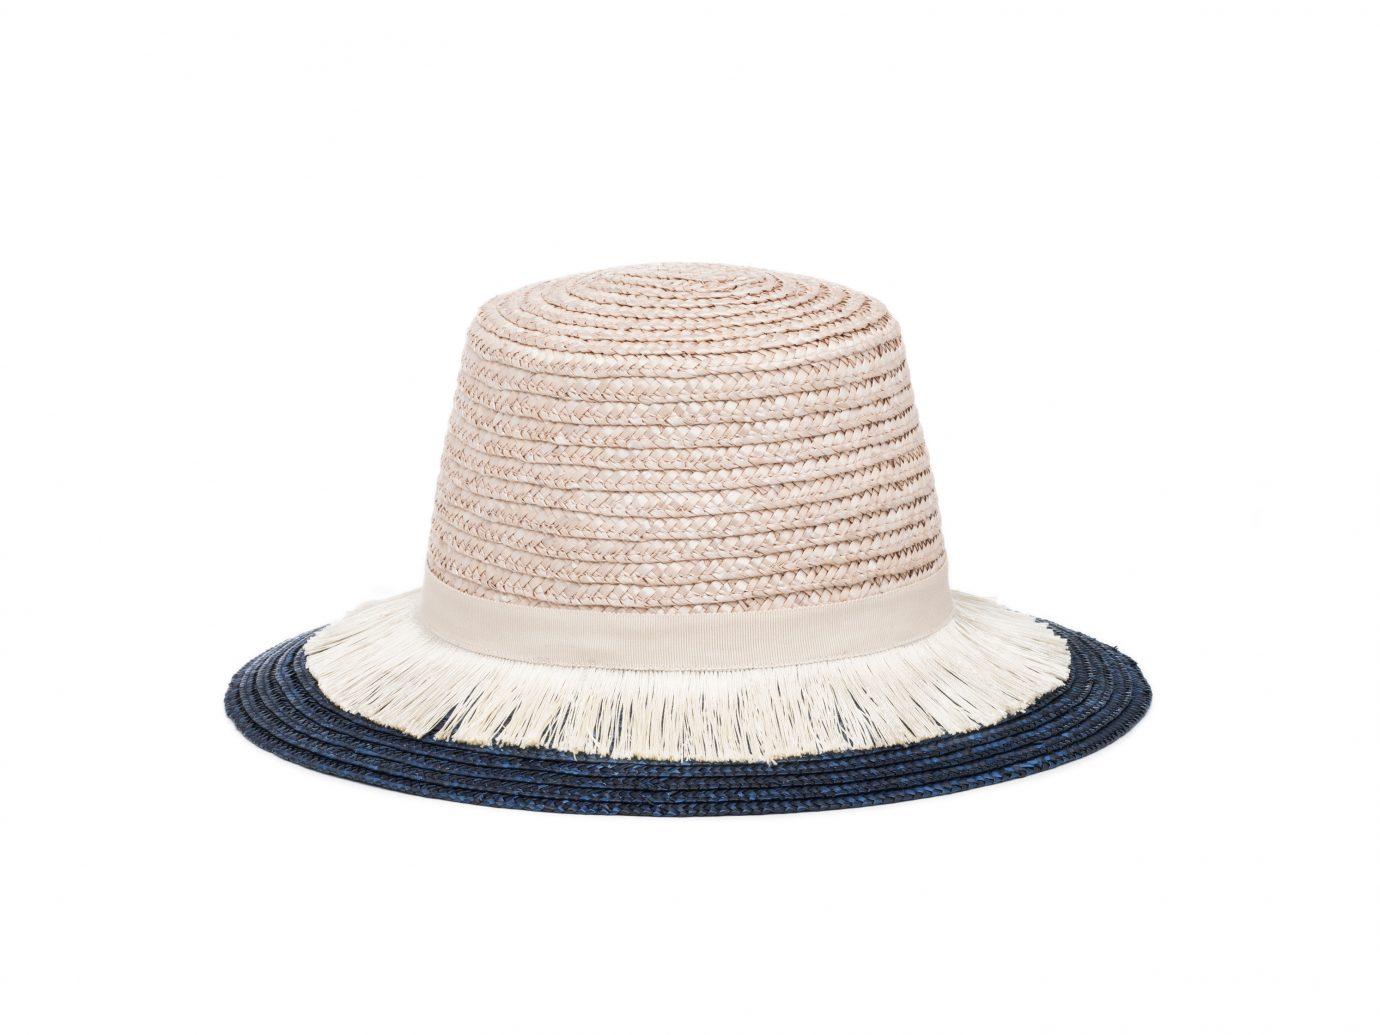 Style + Design clothing hat headdress fashion accessory fedora sun hat cap straw headgear costume accessory